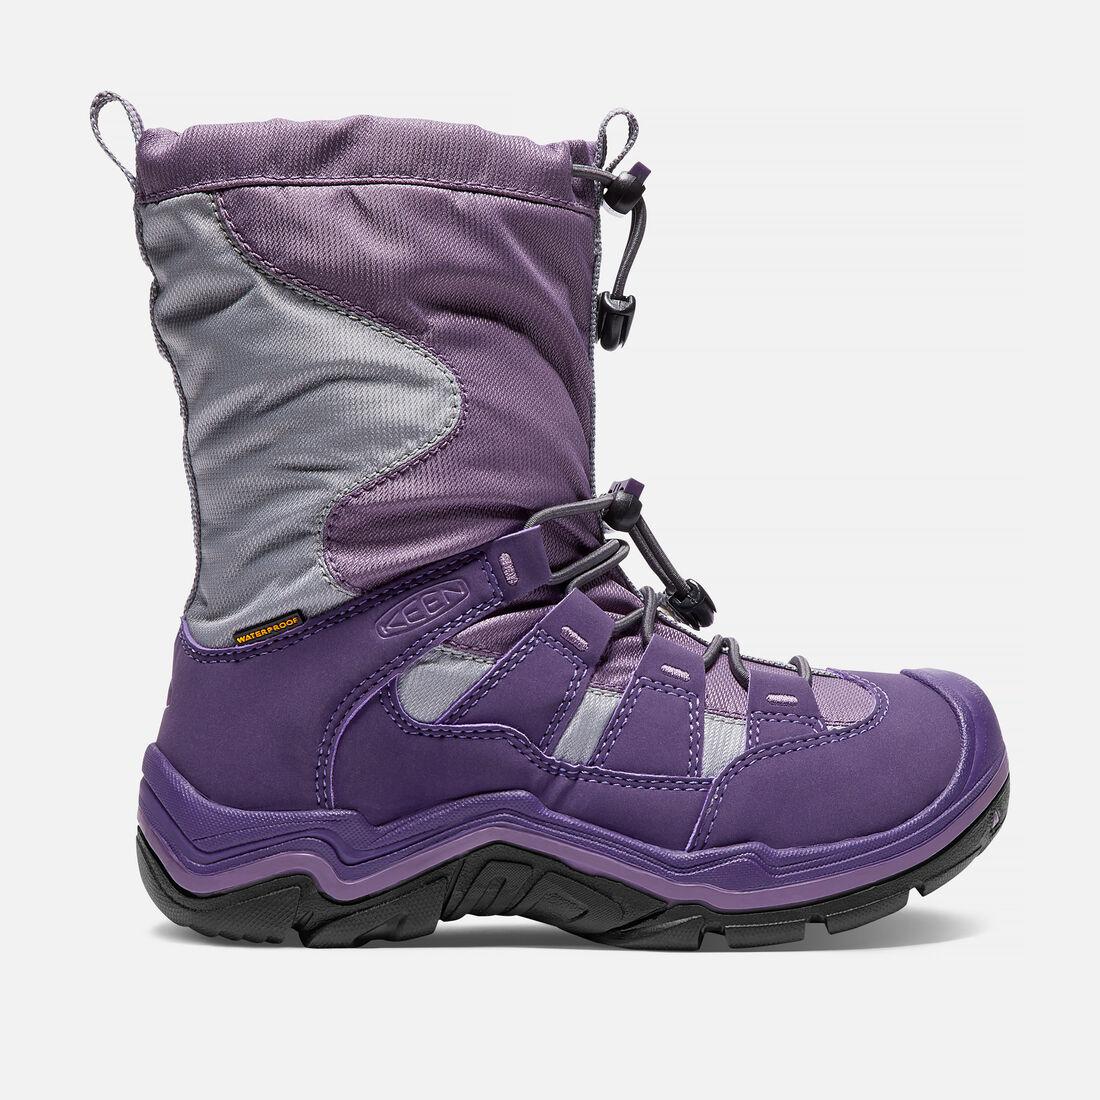 Big Kids' Winterport II Waterproof in Purple Plumeria/Alloy - large view.